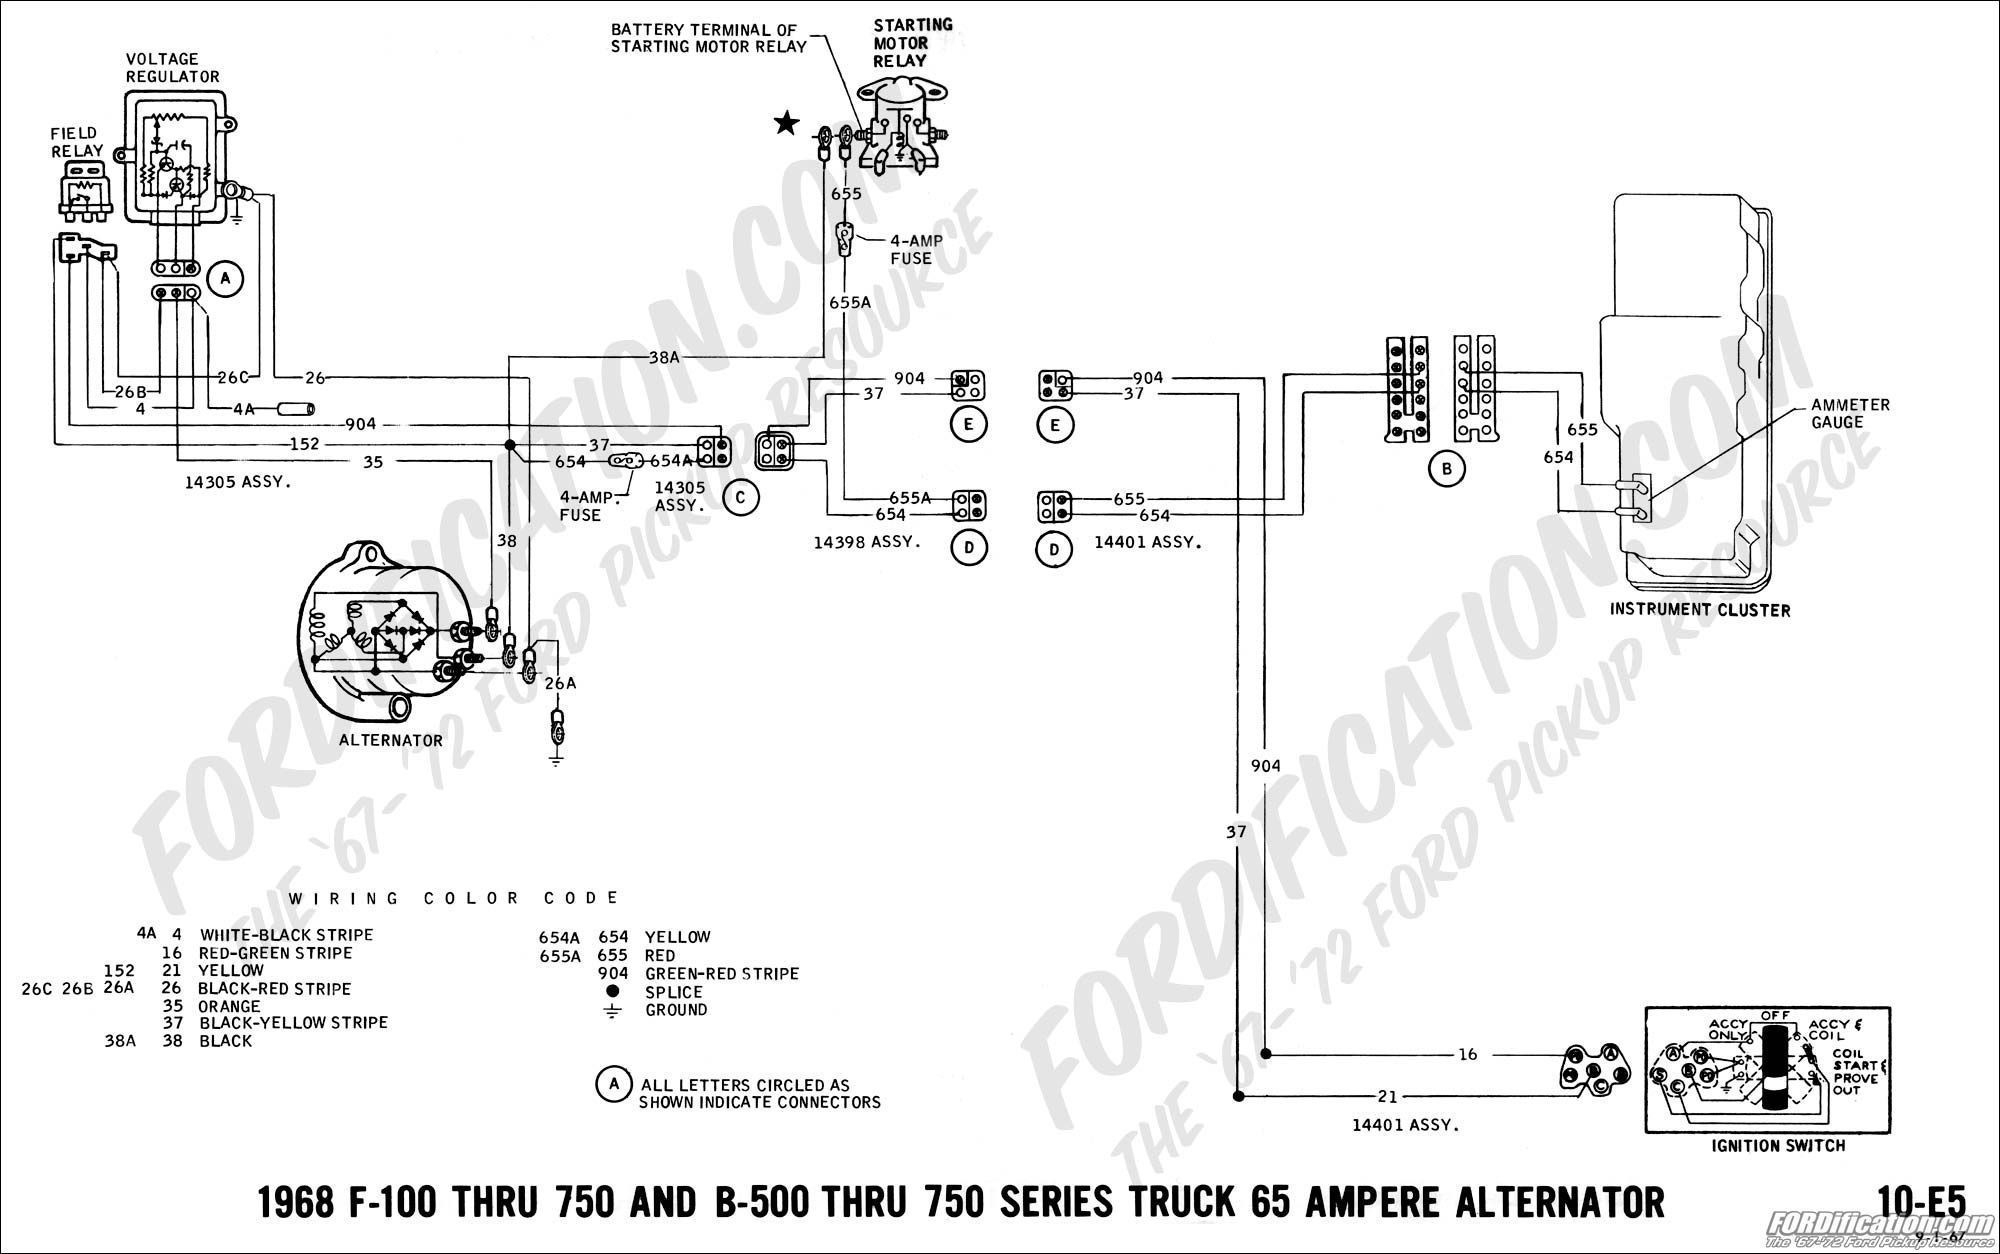 Ford Alternator Wiring Diagram Internal Regulator Unique Simple - Ford Alternator Wiring Diagram Internal Regulator